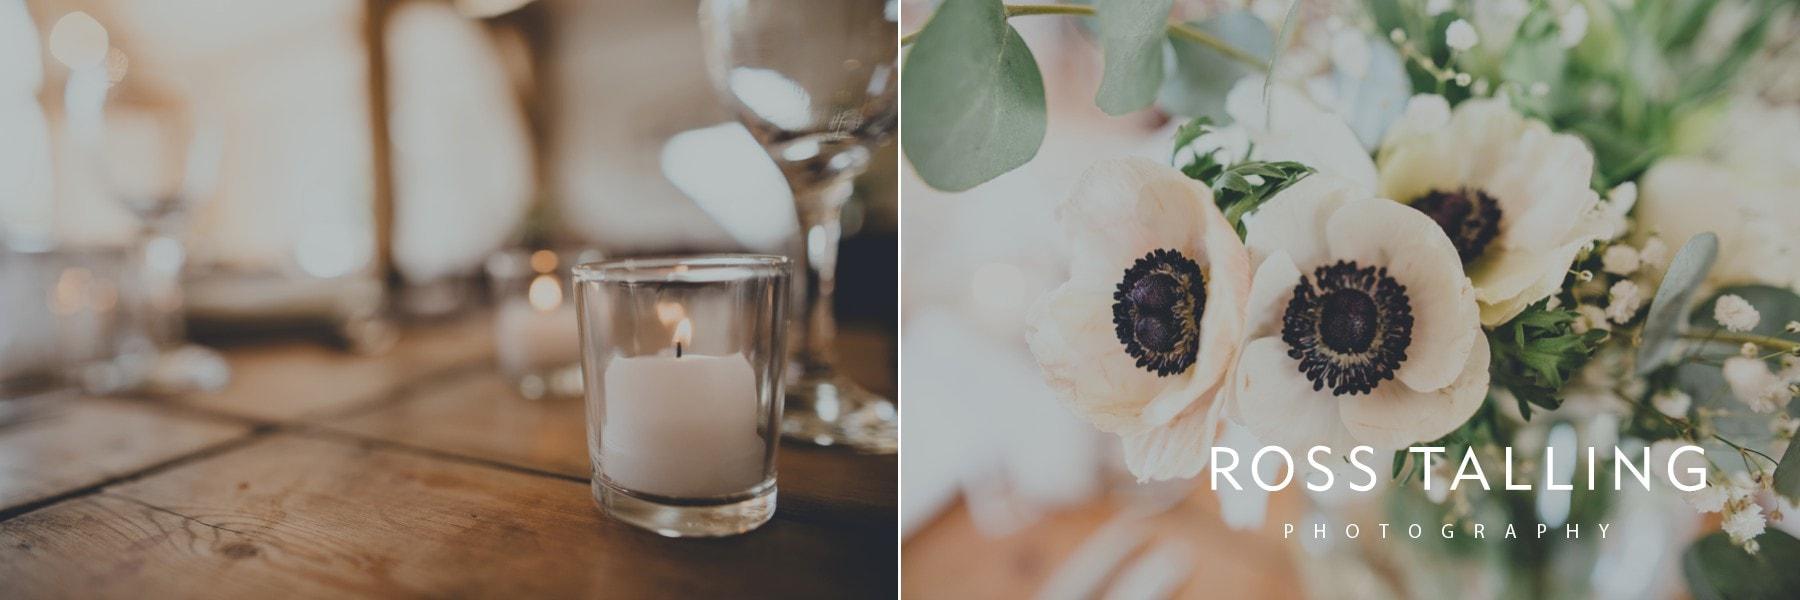 Bonnie & James Wedding Photography Cornwall_0103